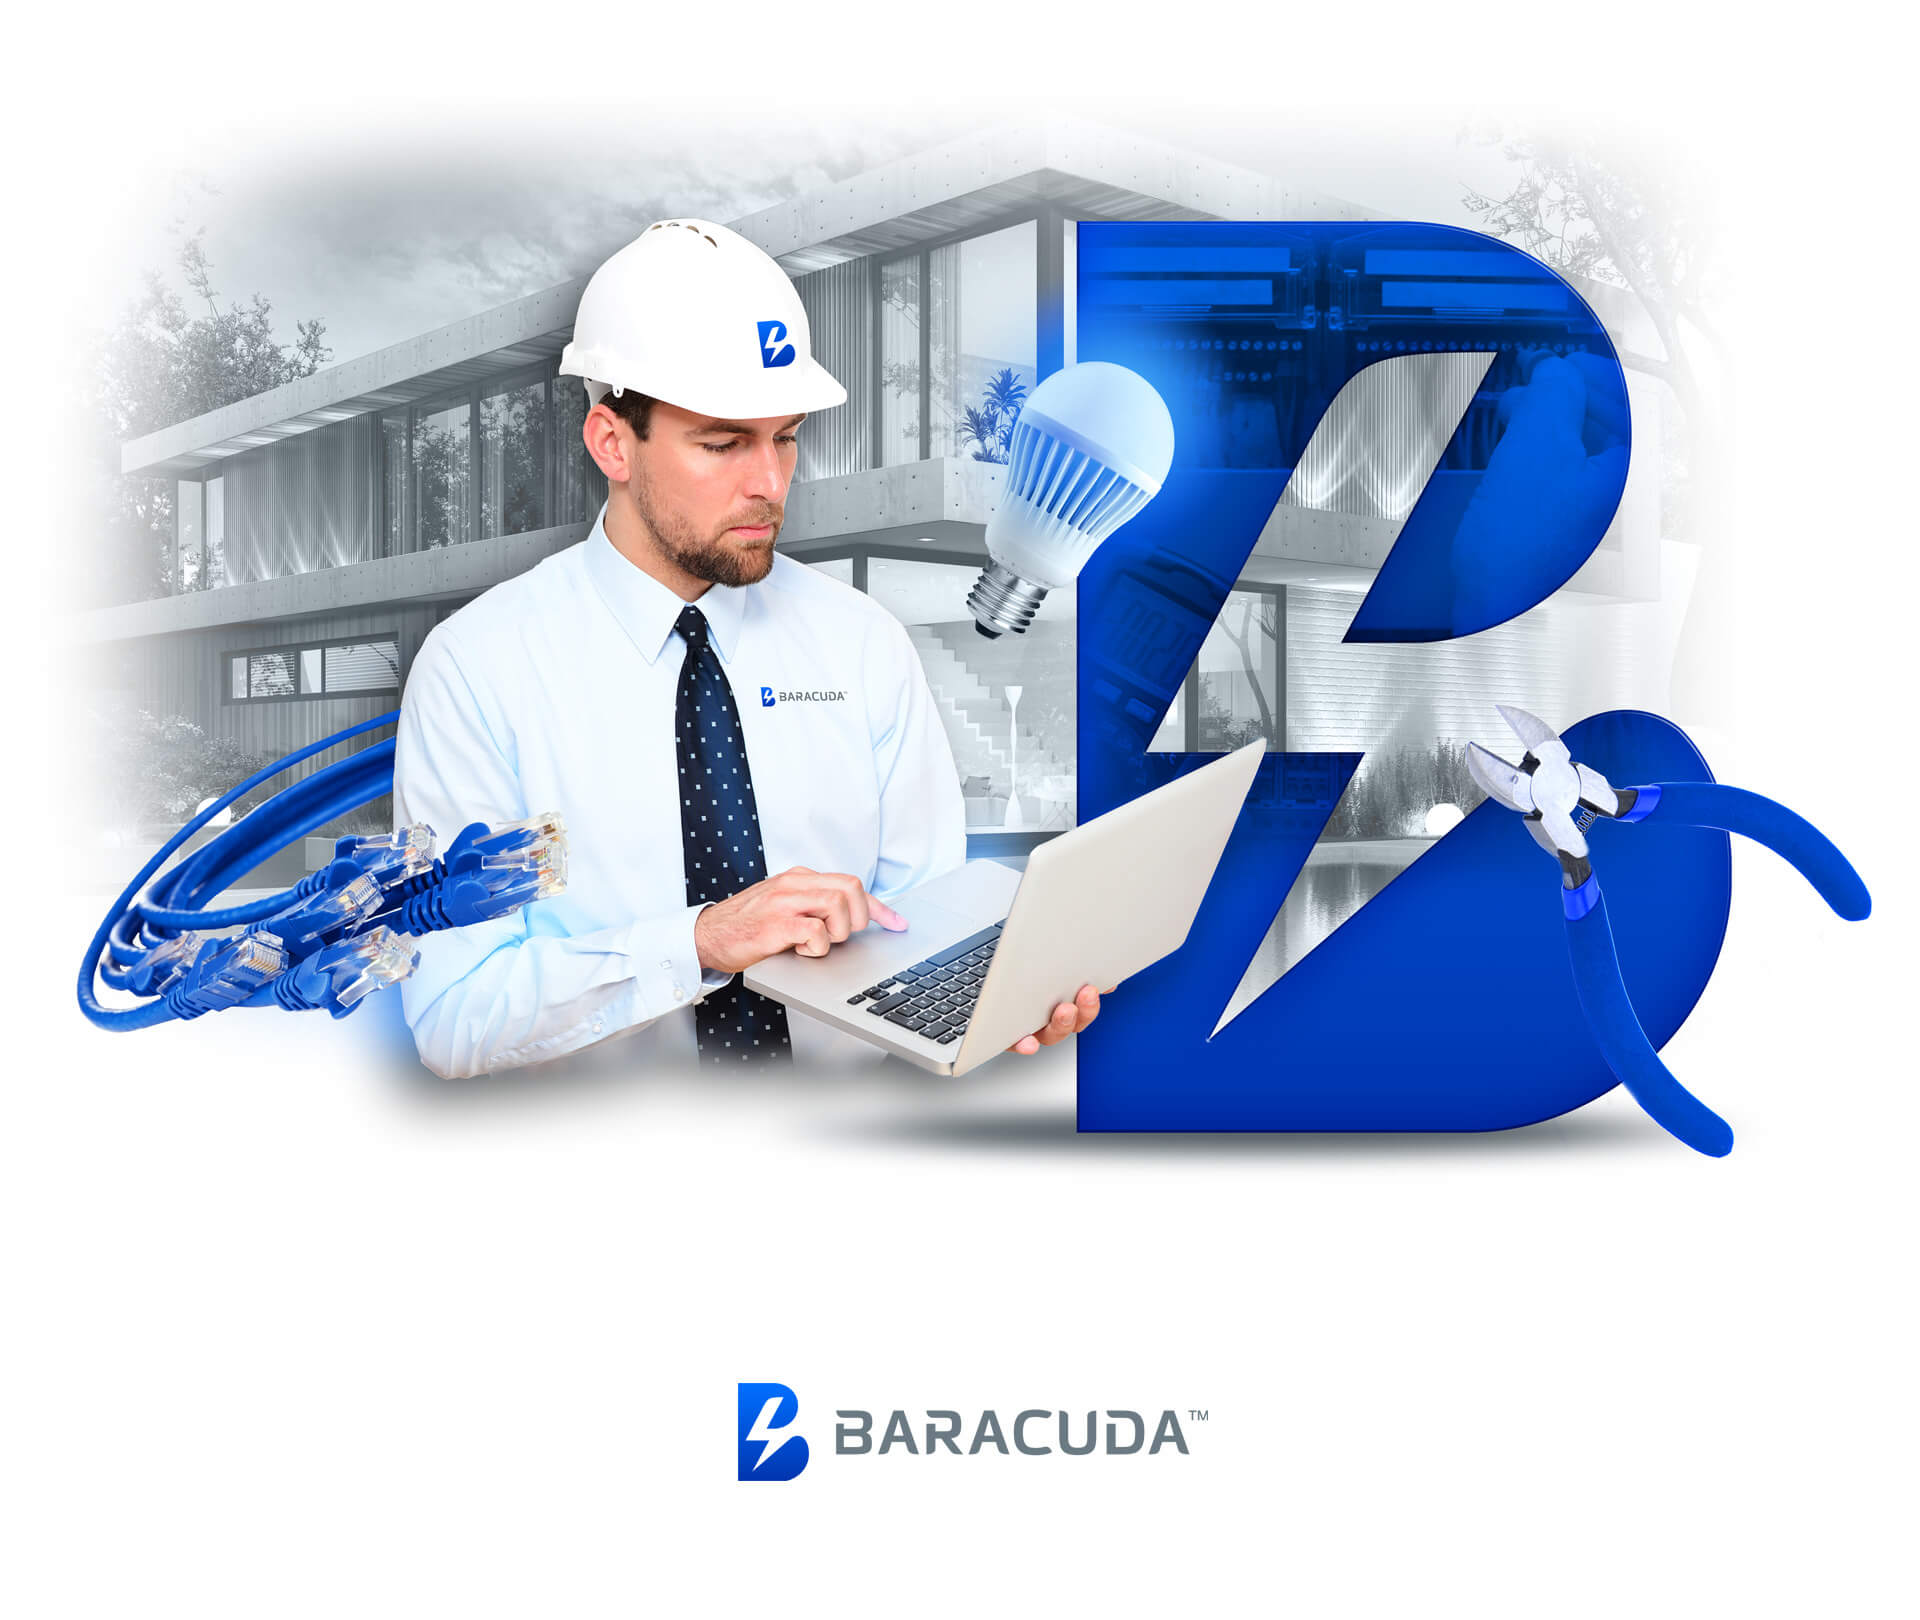 Baracuda projekt slider strony internetowej